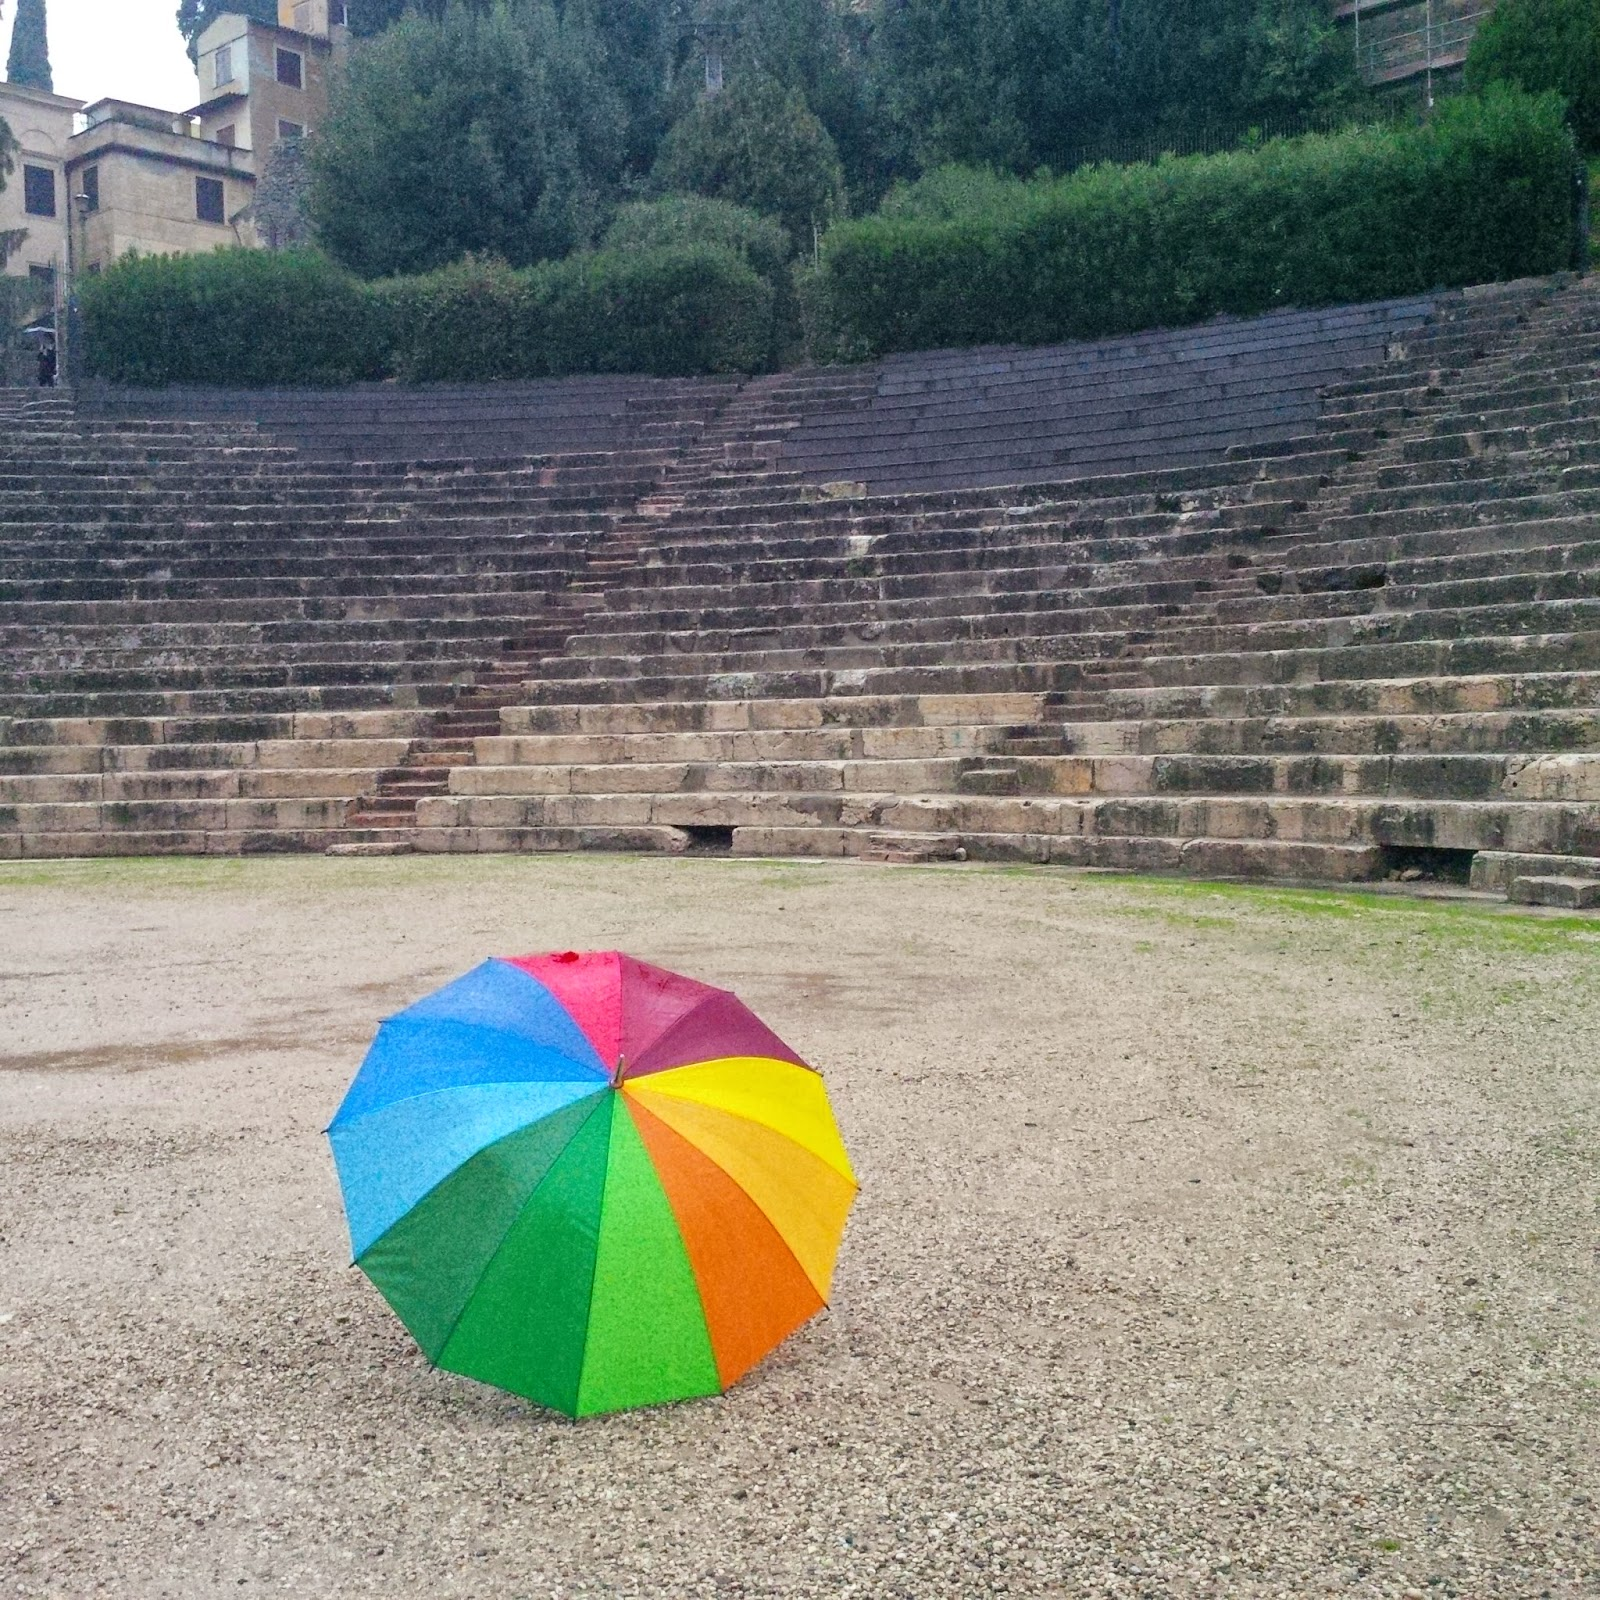 My favourite place in Verona - the Roman Theatre